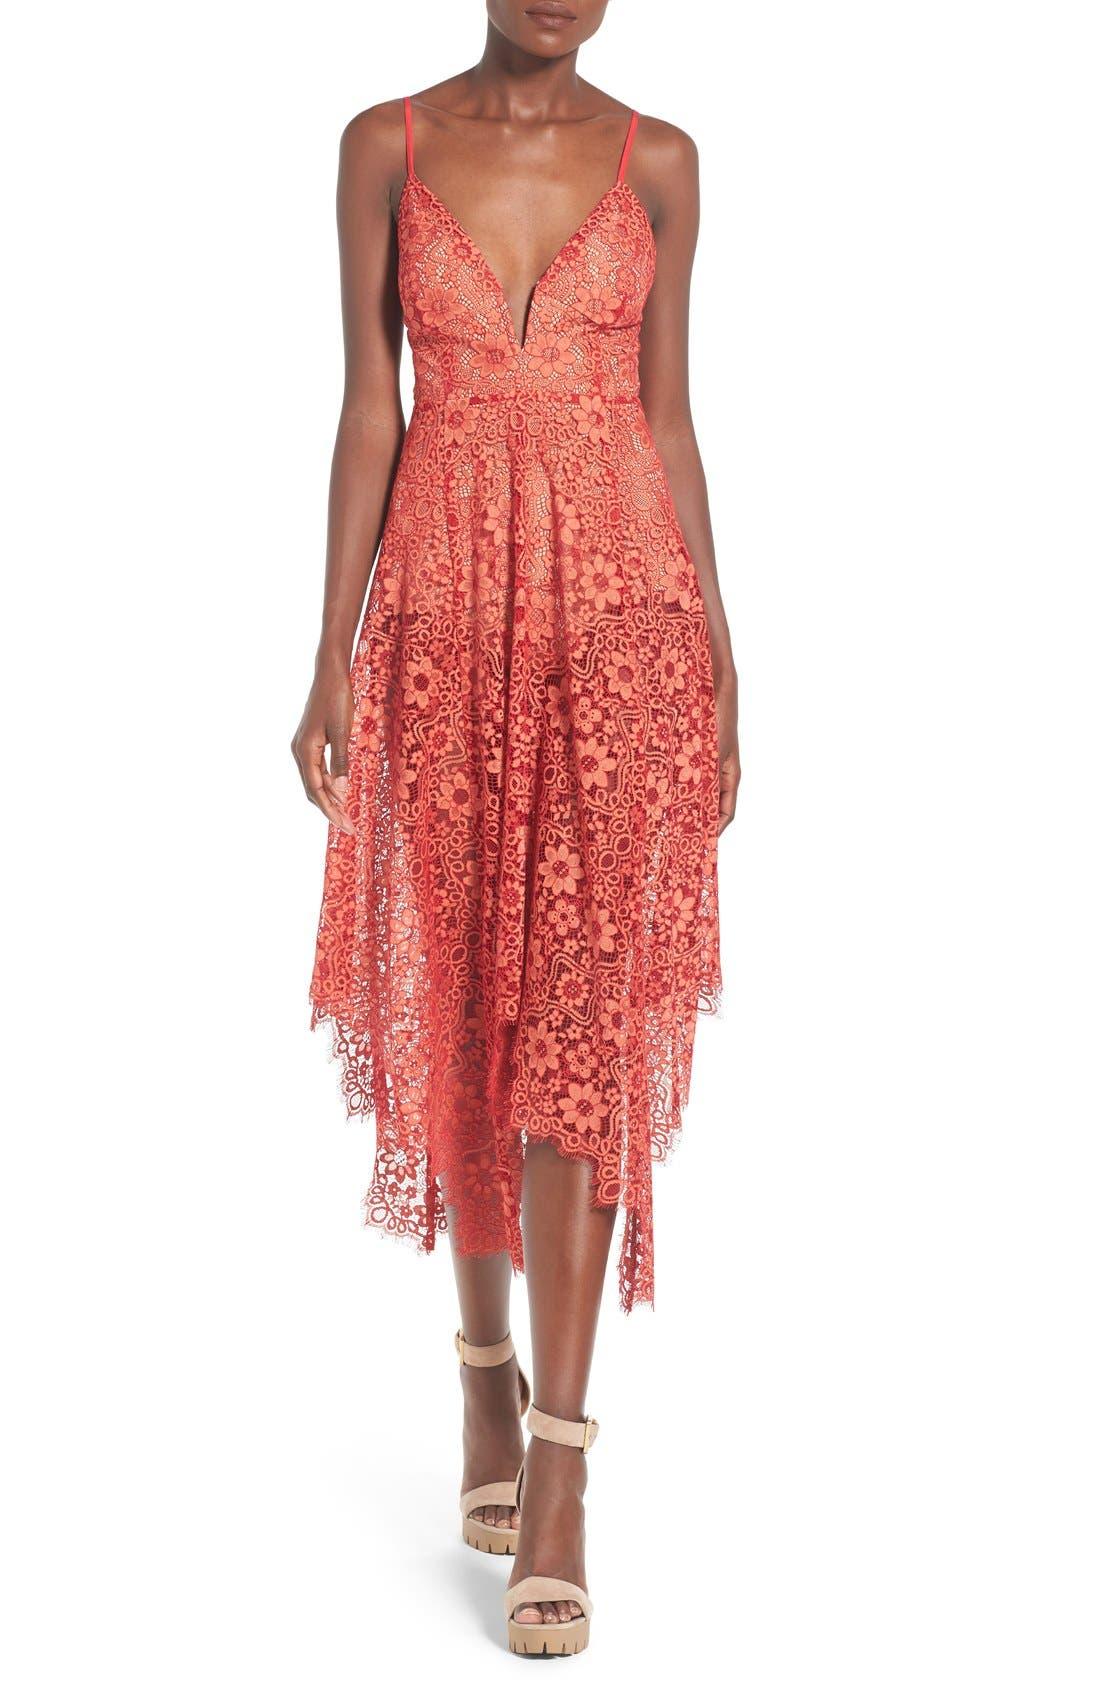 Alternate Image 1 Selected - For Love & Lemons 'Rosemary' Handkerchief Hem Lace Midi Dress